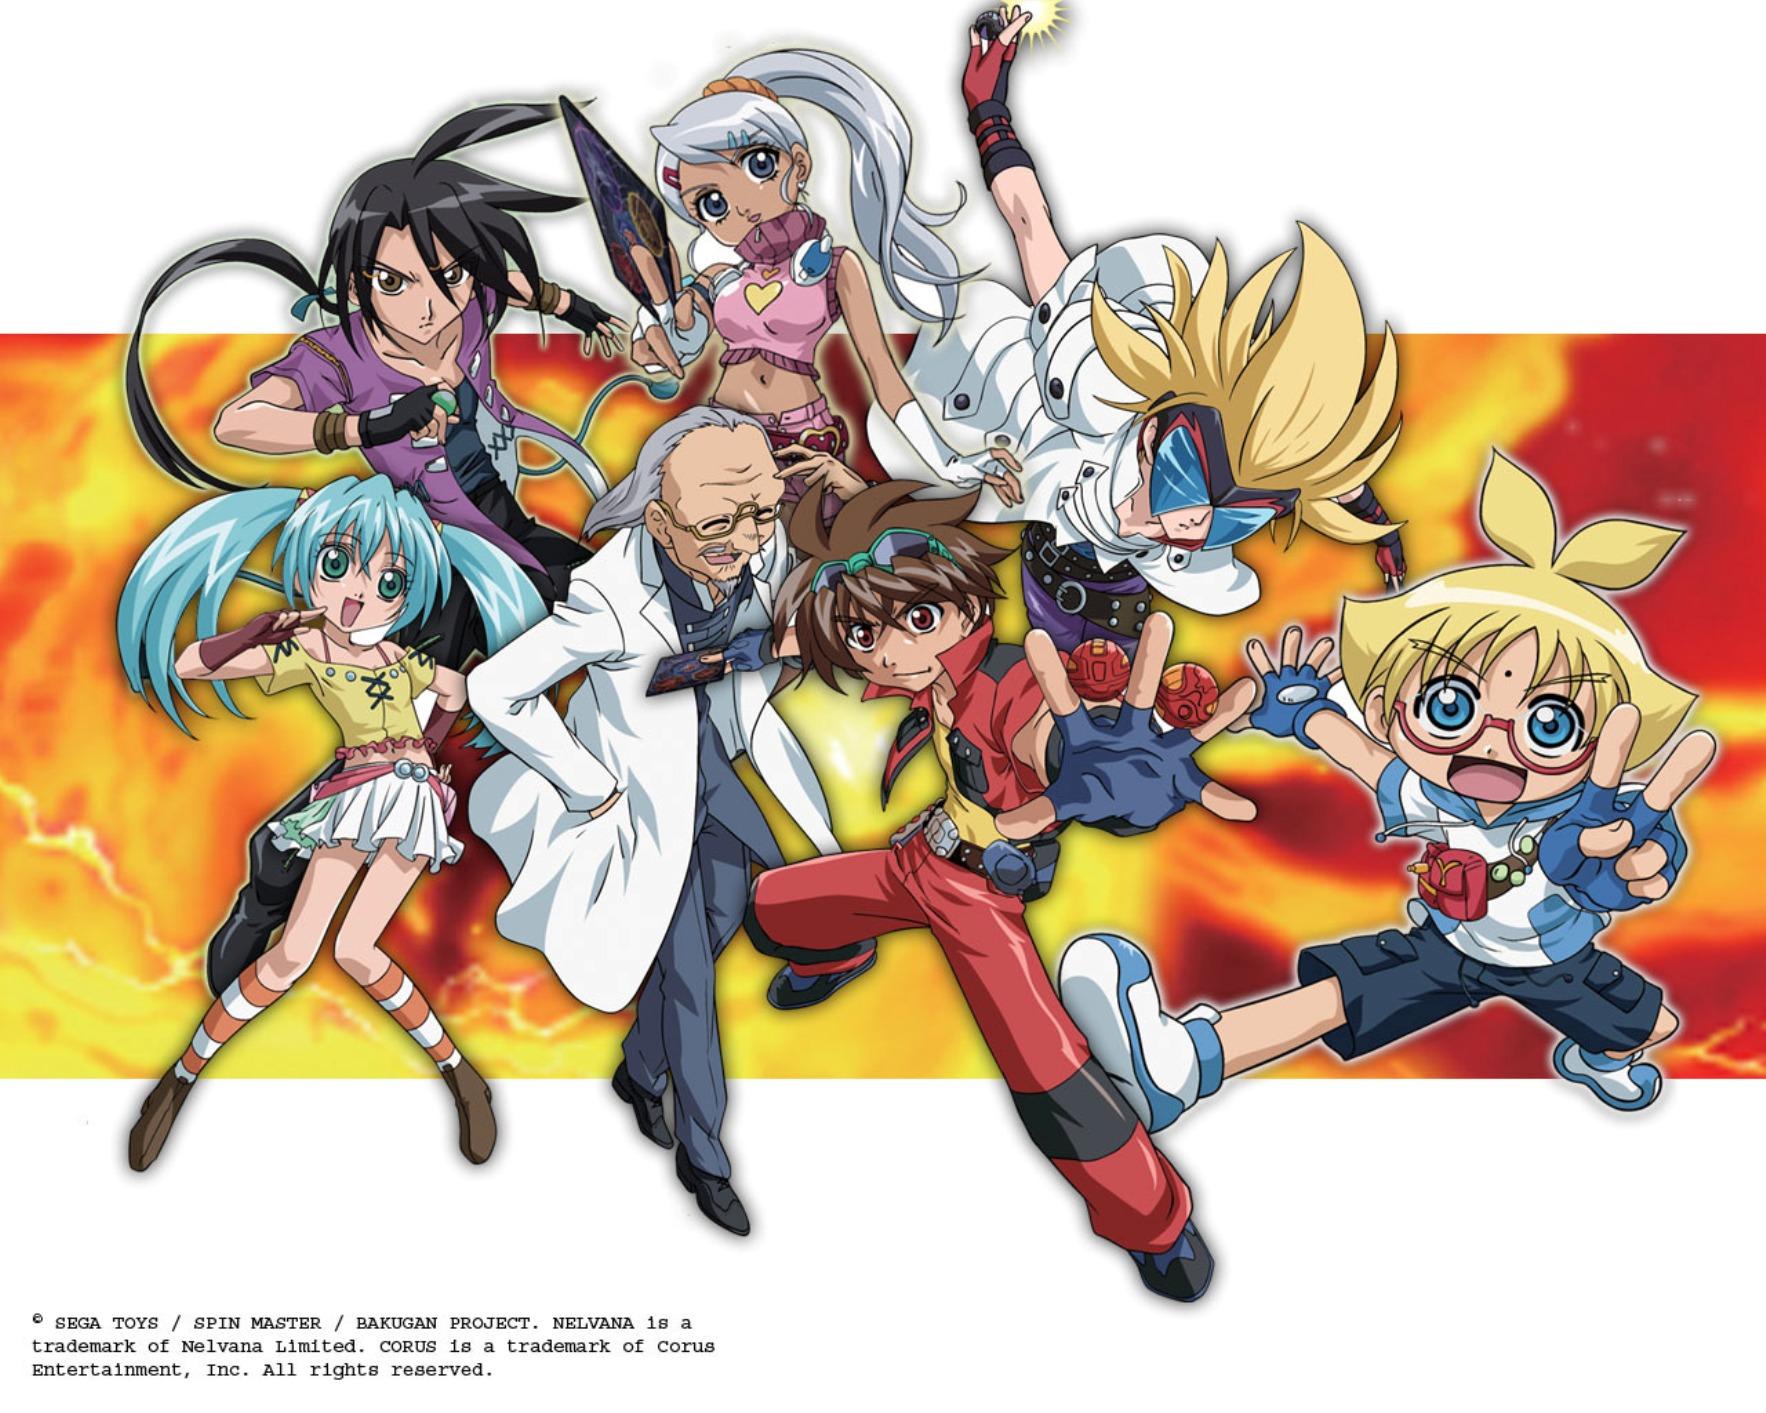 Bakugan anime visual 1